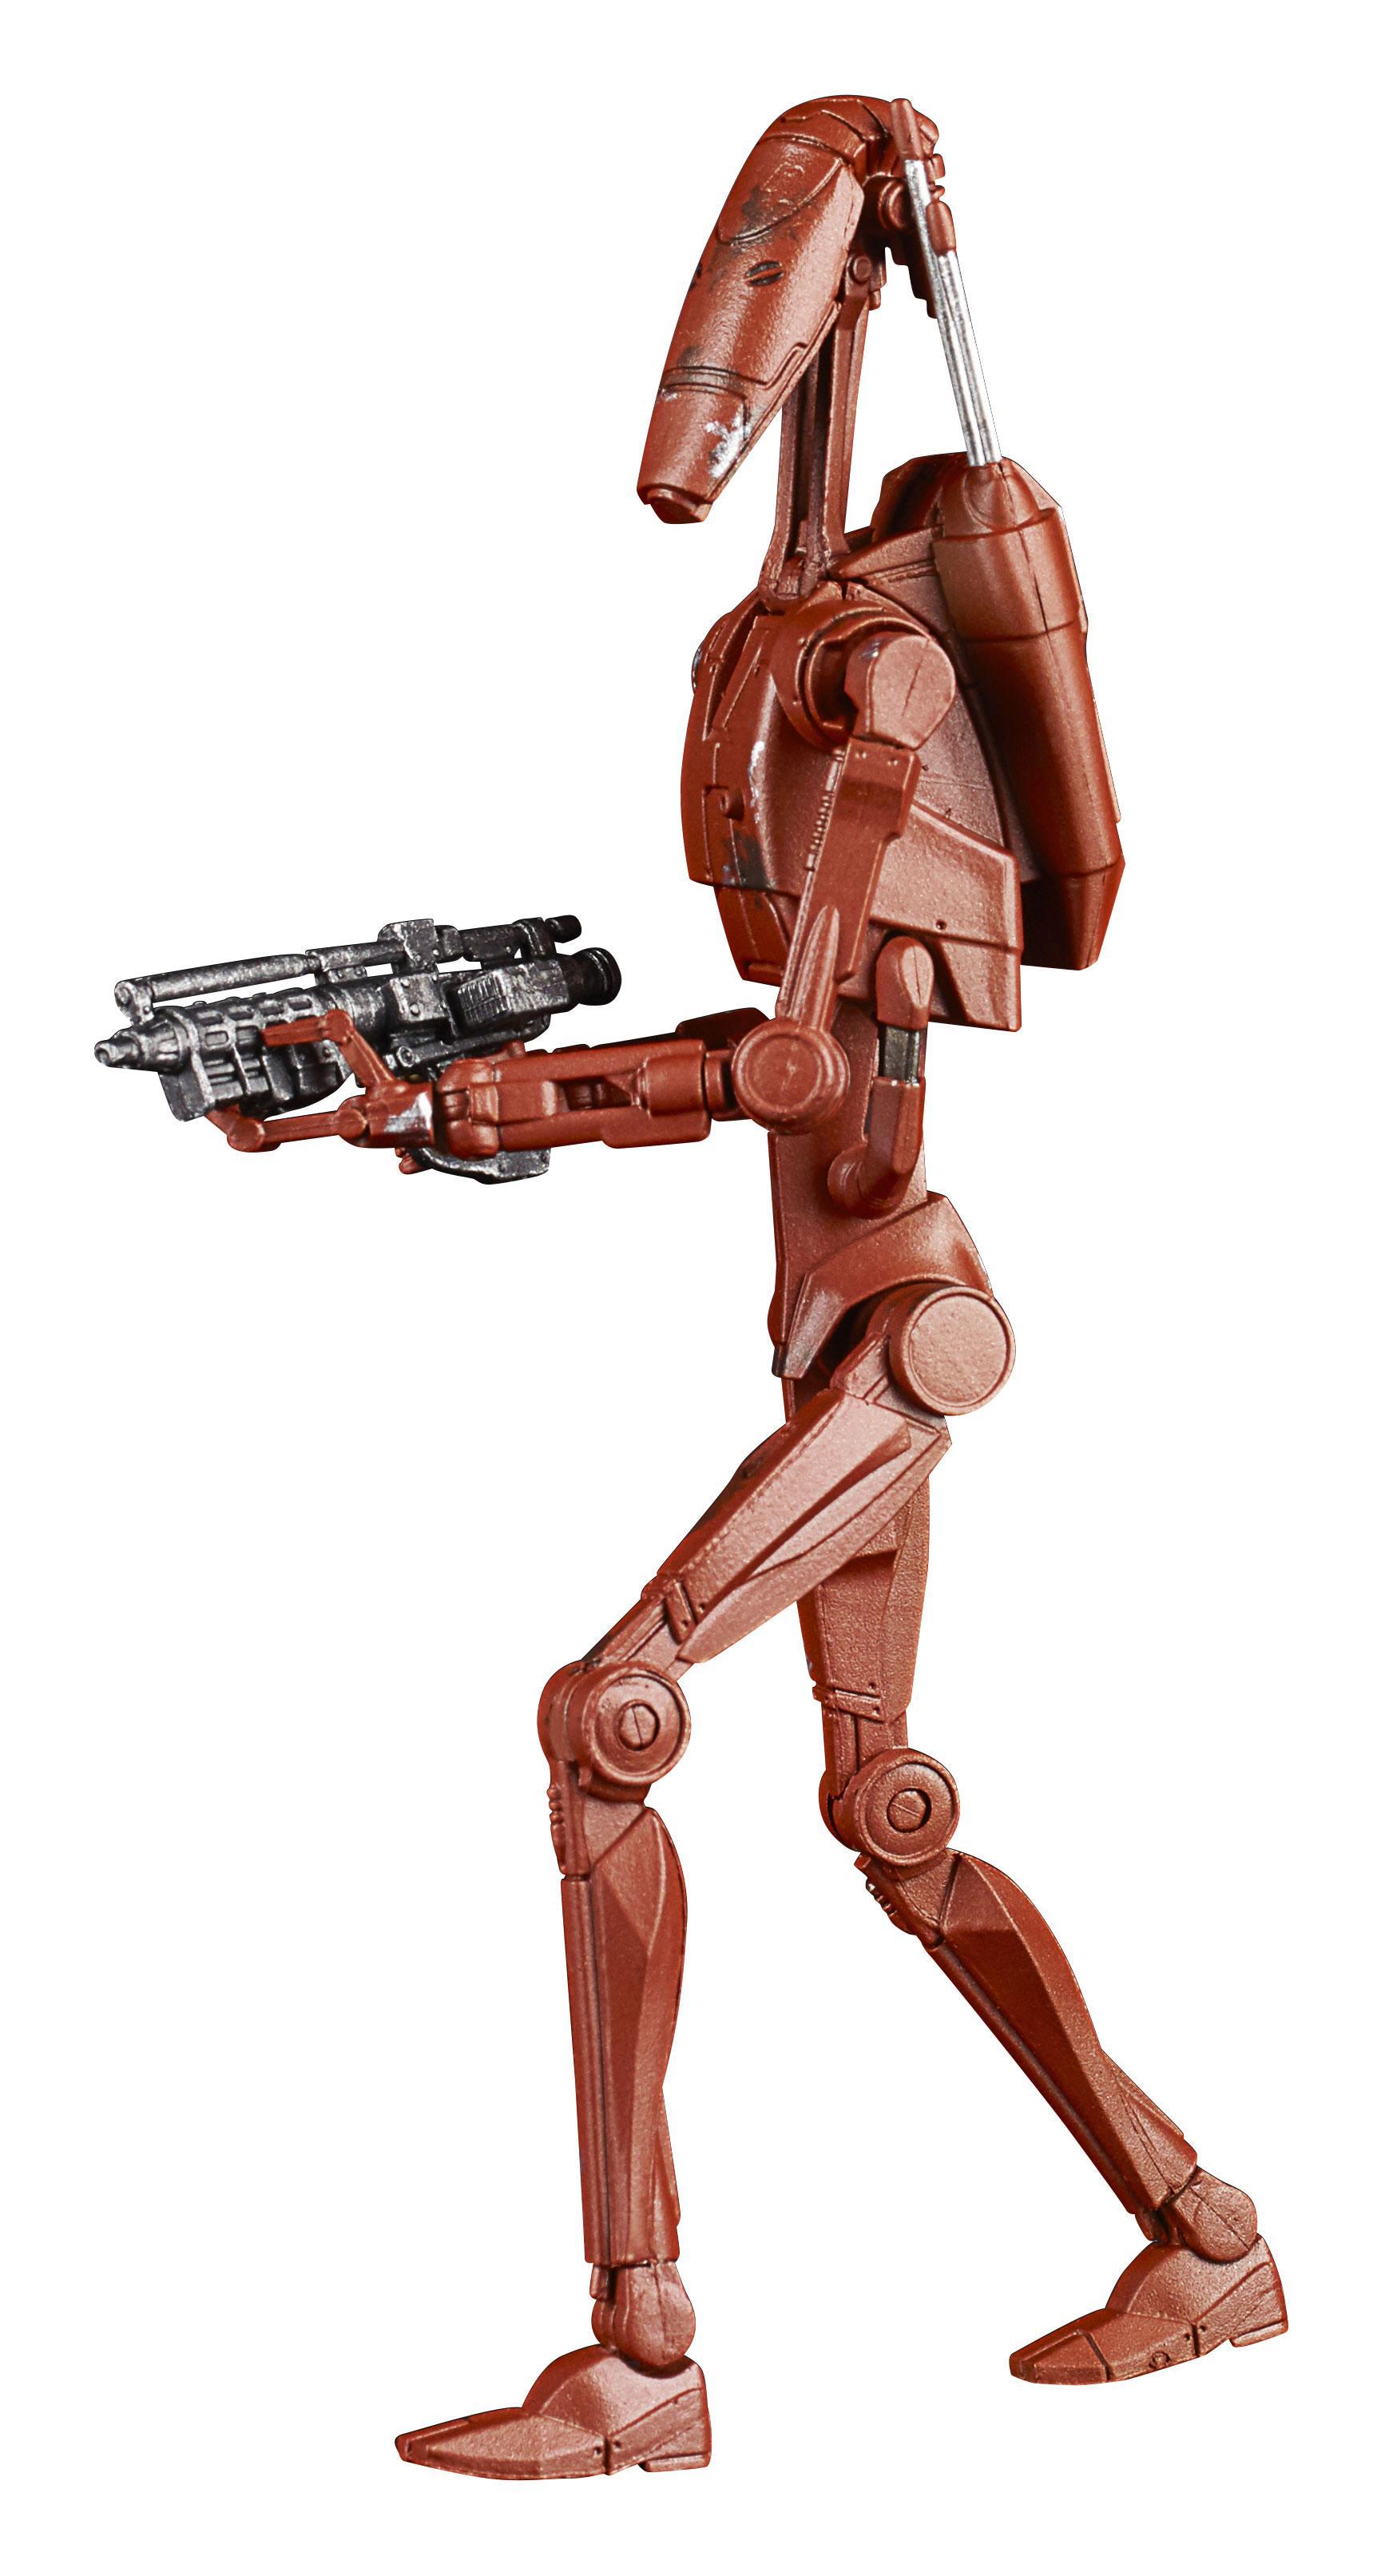 Star Wars The Black Series Battle Droid (Geonosis) Action Figure 15cm E9327 5010993731459